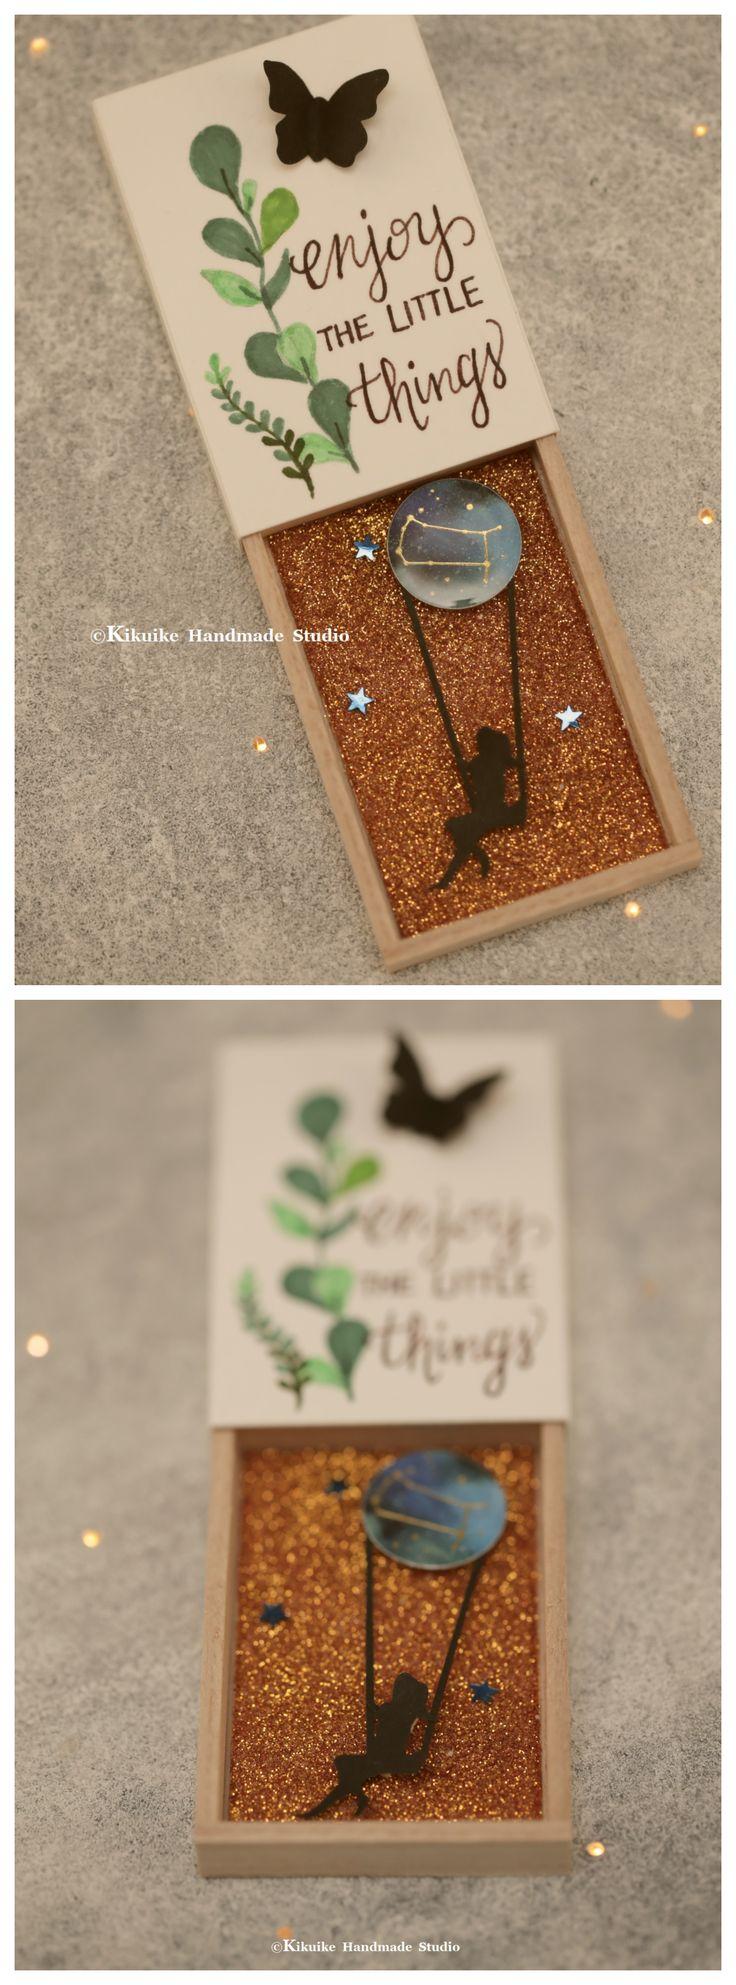 Hand cut shadow art,Matchbox card,handmade shadow box,Gift Box,miniatures,cheer up box,Valentine's Gift,Gift for her/him,Girlfriend gift, holiday card, matchbox art and matchbox message card ideas